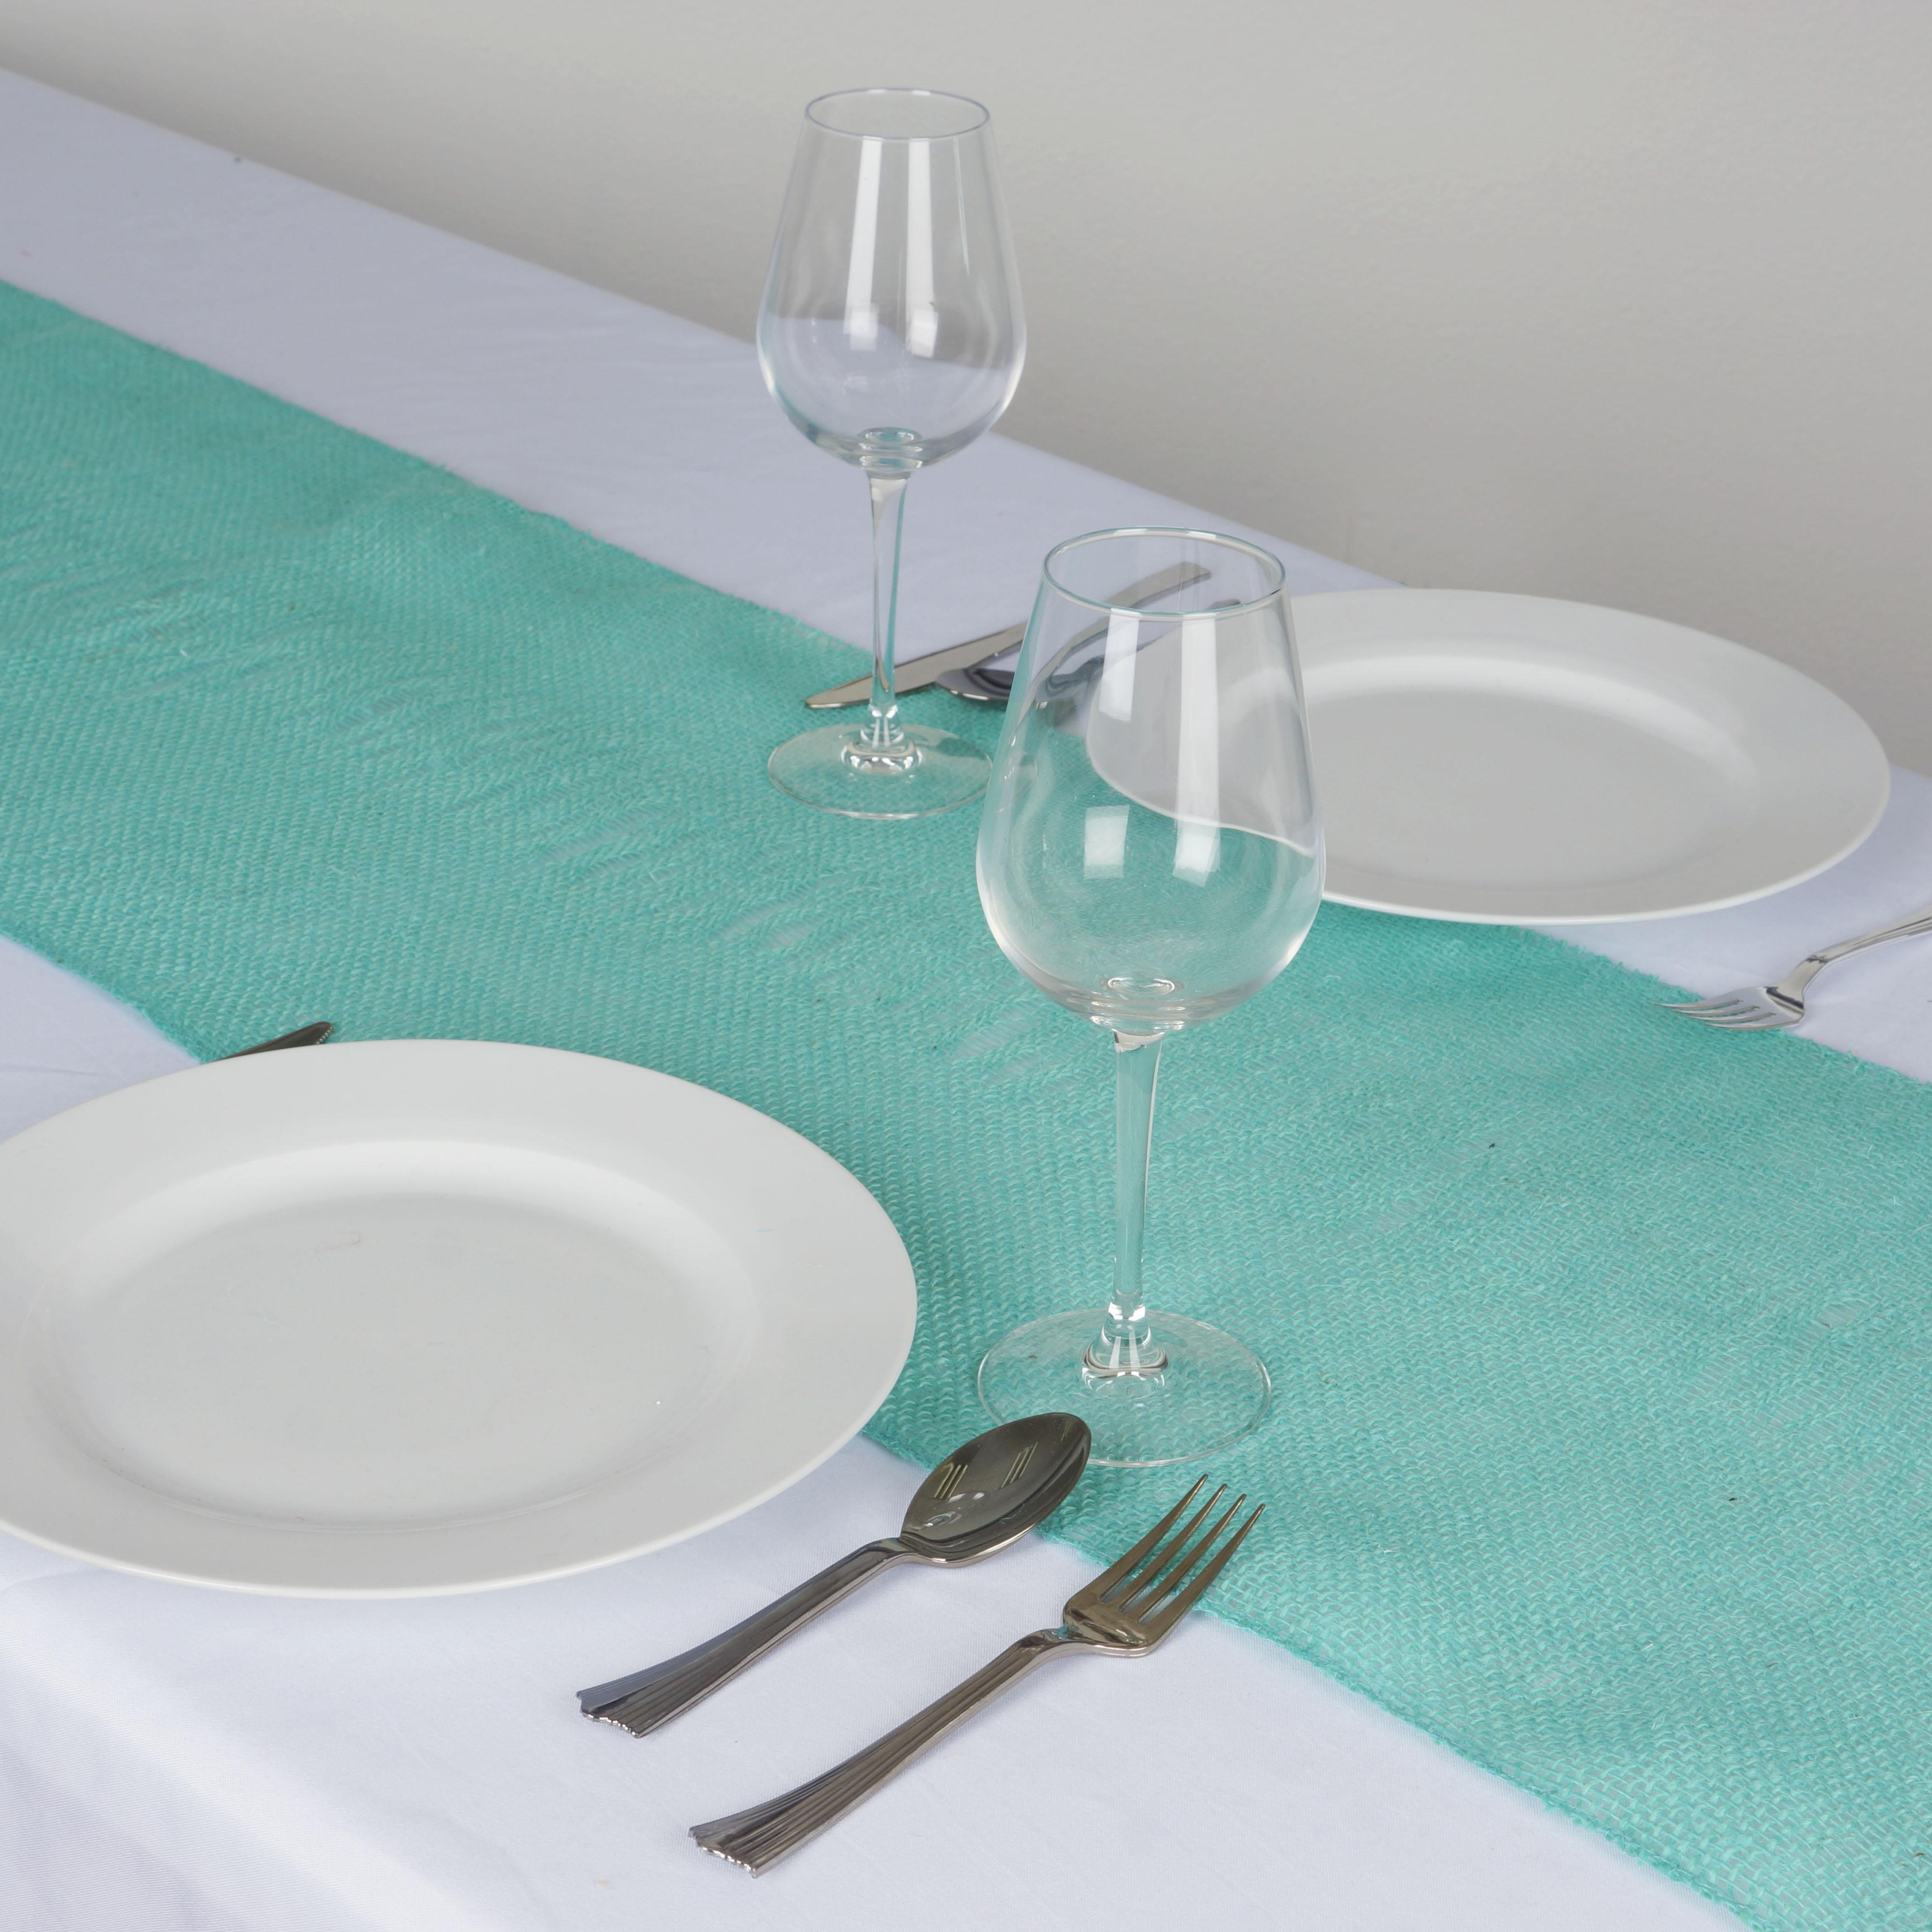 "BalsaCircle 14"" x 108"" Burlap Jute Table Top Runner - Wedding Party Reception Linens Dinner Event Decorations"